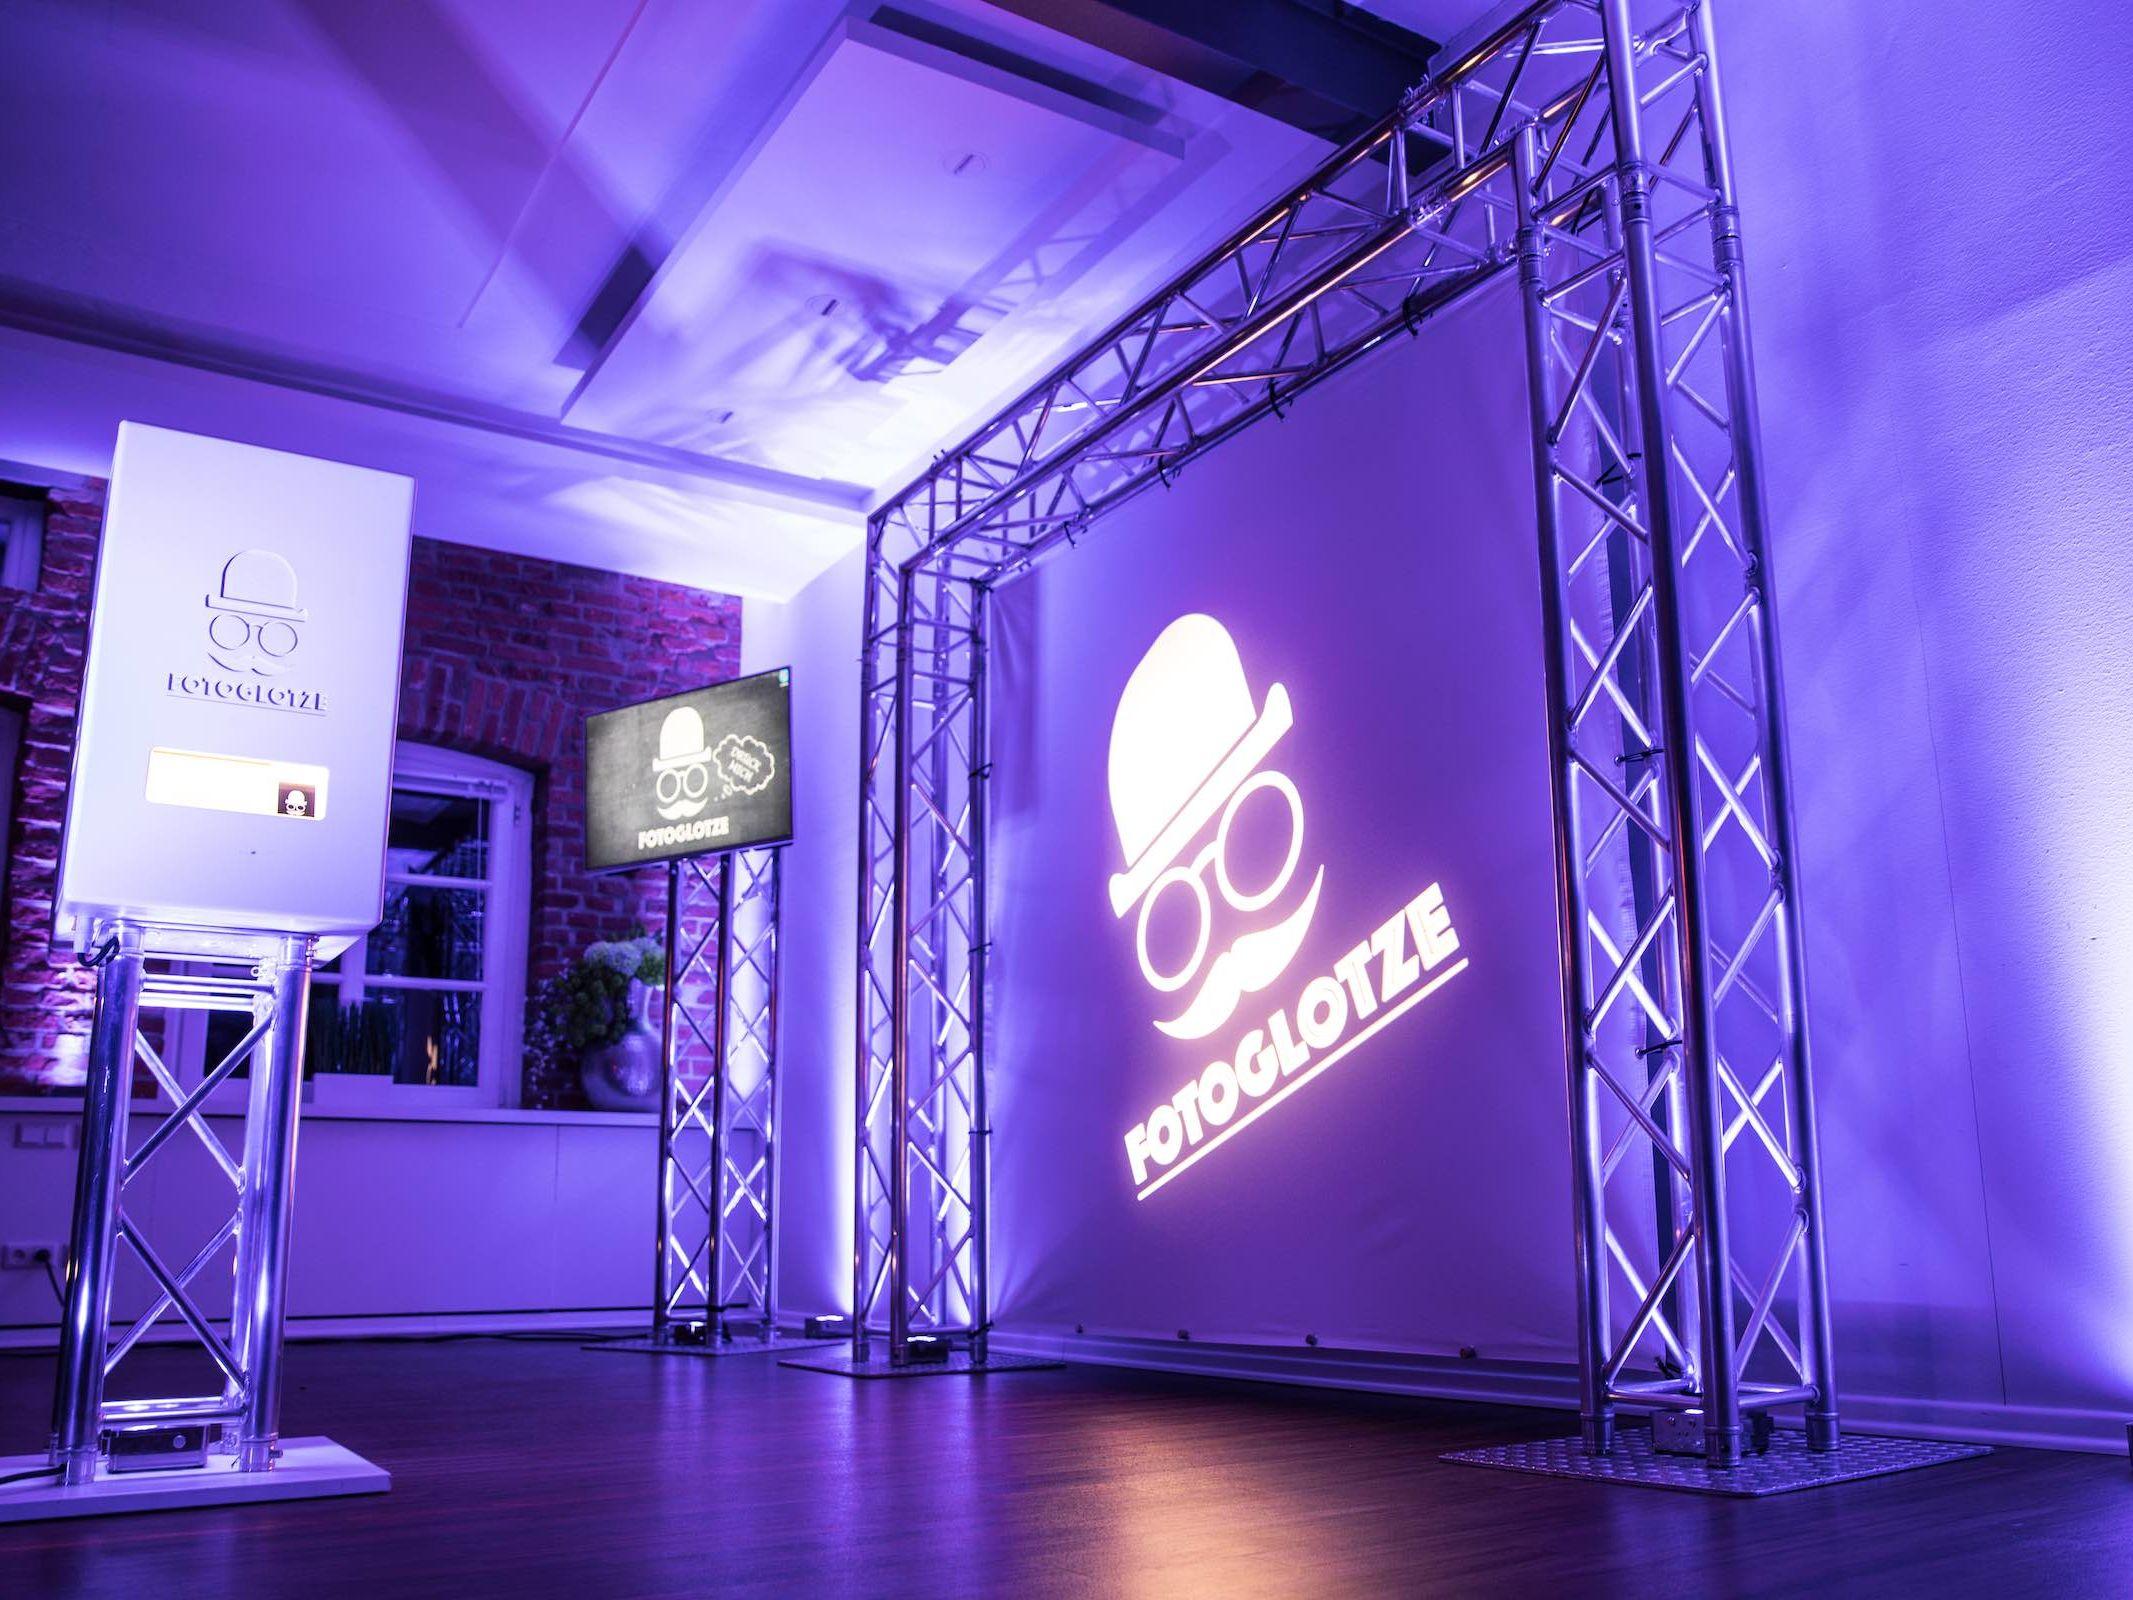 Fotobox | Hannover | Druck | Ausdruck | Sofortdruck | Fotokiste | Photobooth | Hochzeit | Messe | Event | Firmenfeier | Abiball | Verkleidung | Requisiten | Hannover | Buchen | Anfragen | Mieten | Fotoglotze